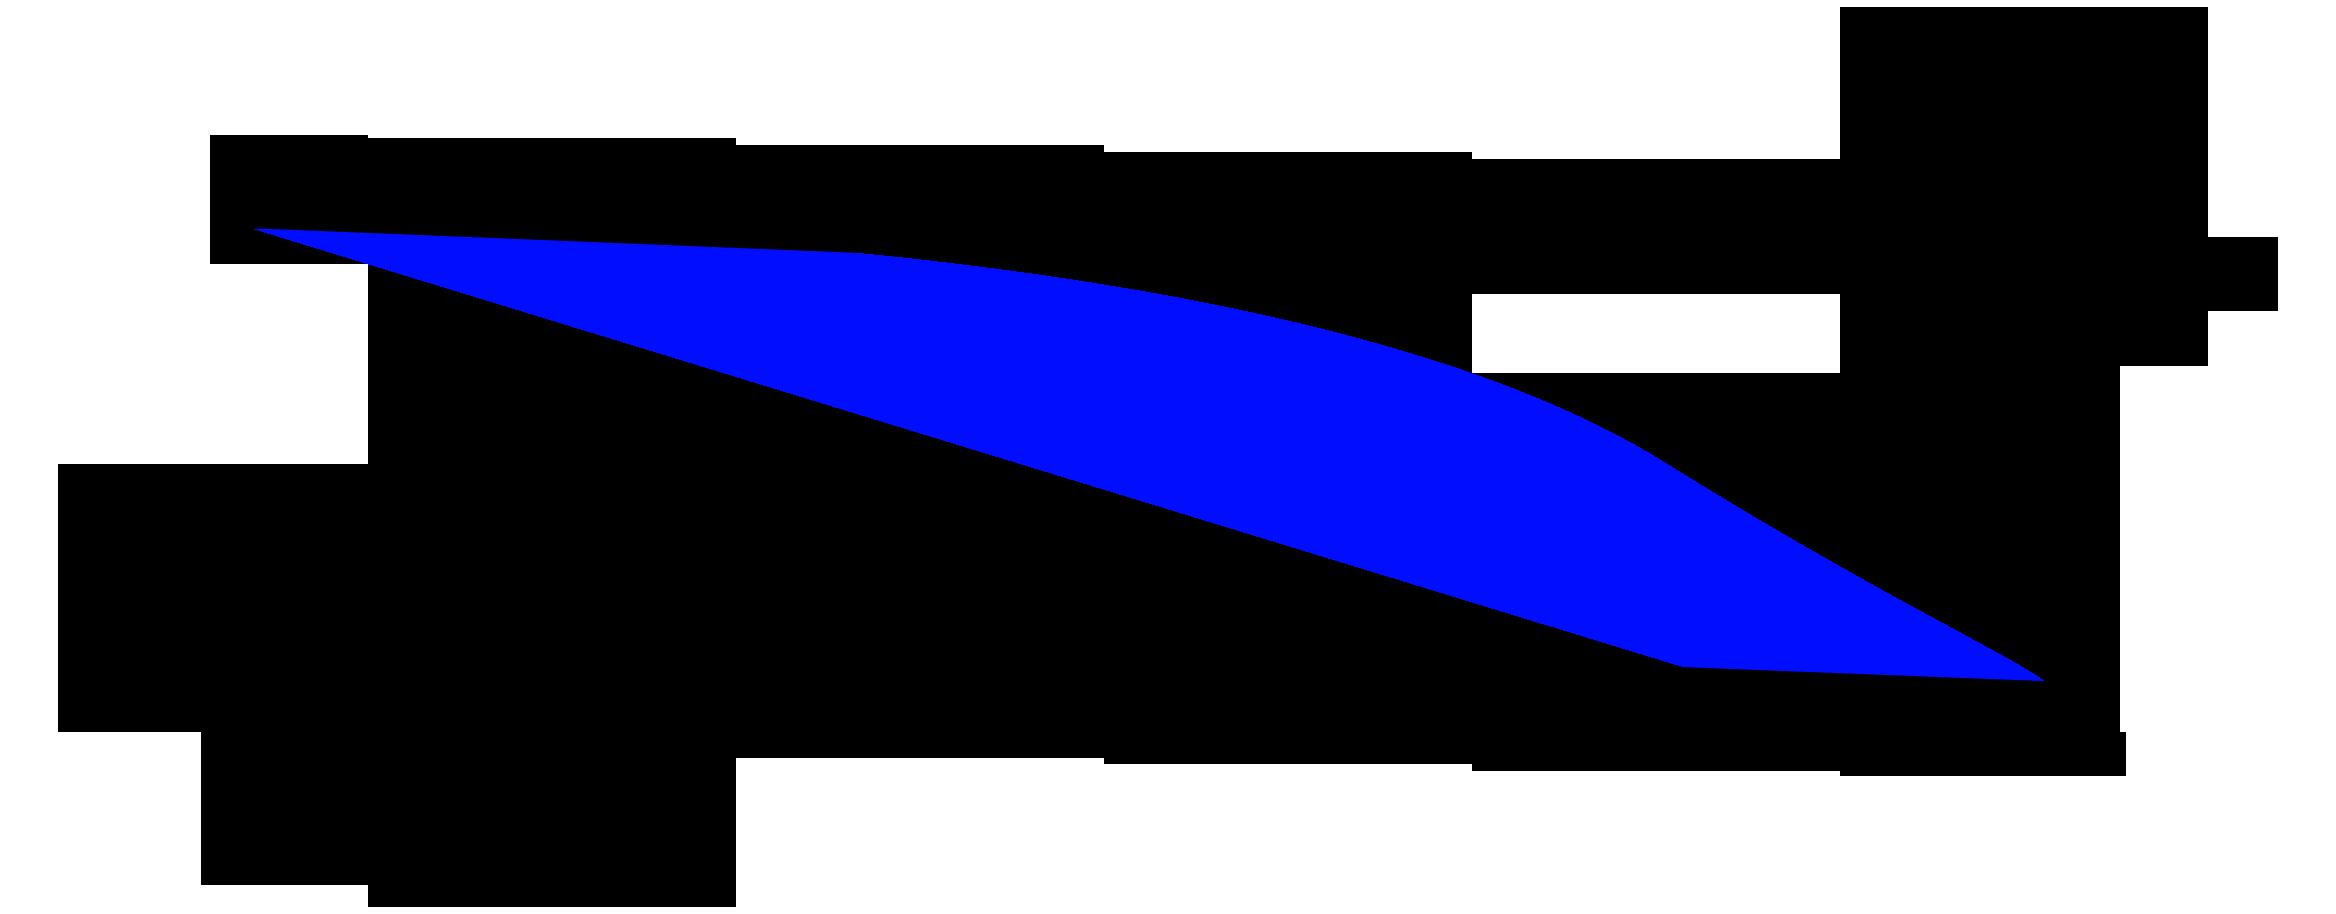 Logo Design by Safal Adam - Entry No. 293 in the Logo Design Contest Creative Logo Design for Strategyah.